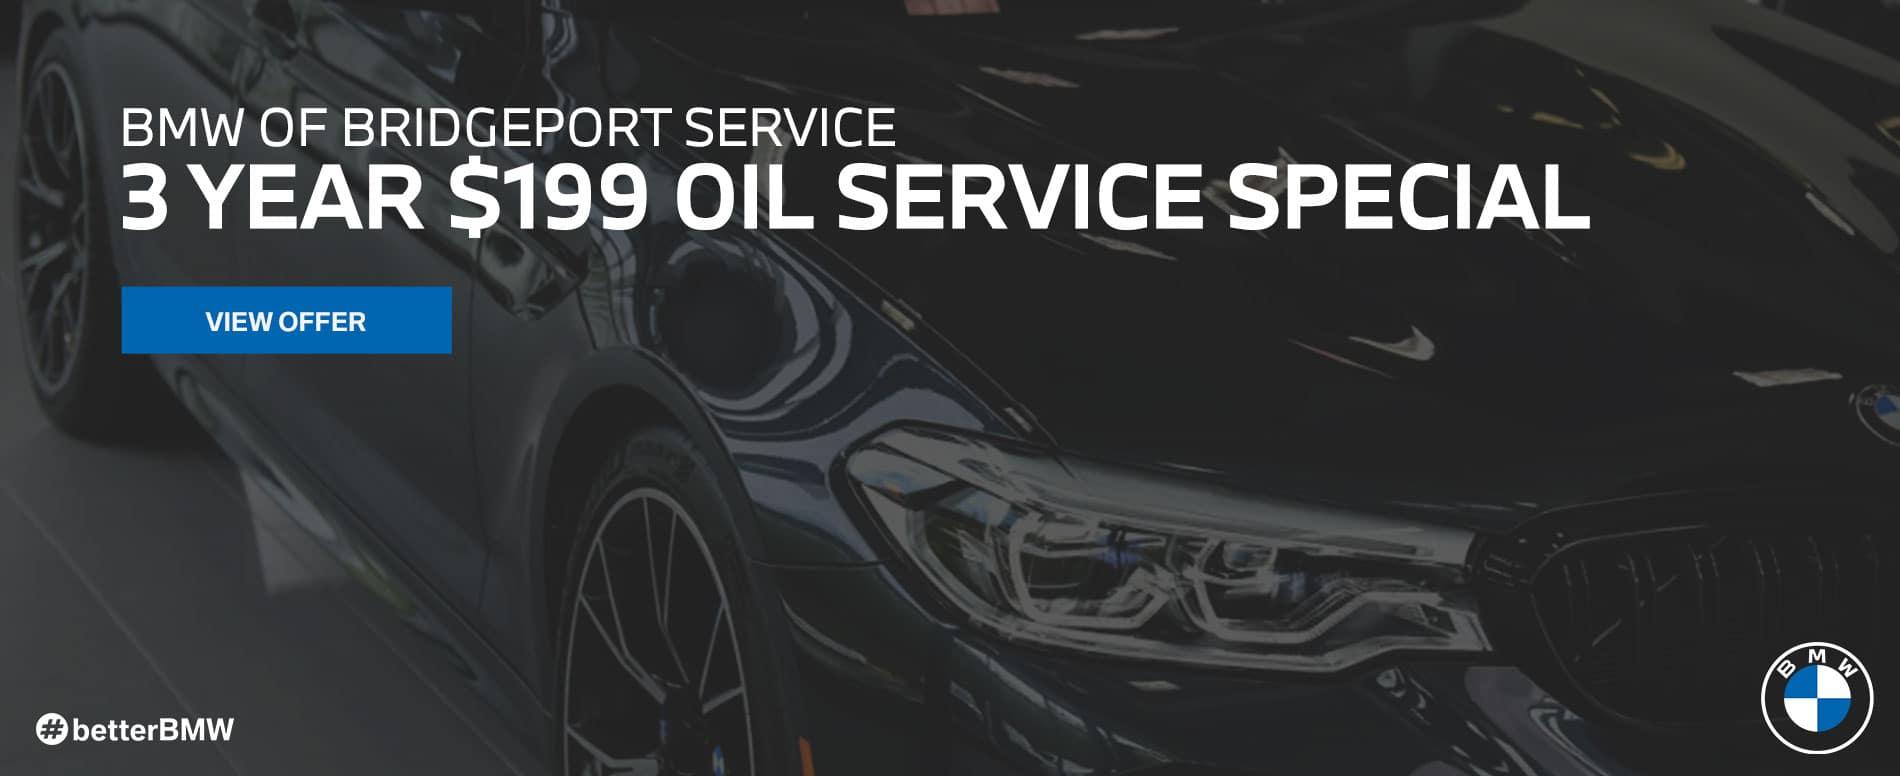 BPT_Service-Banner